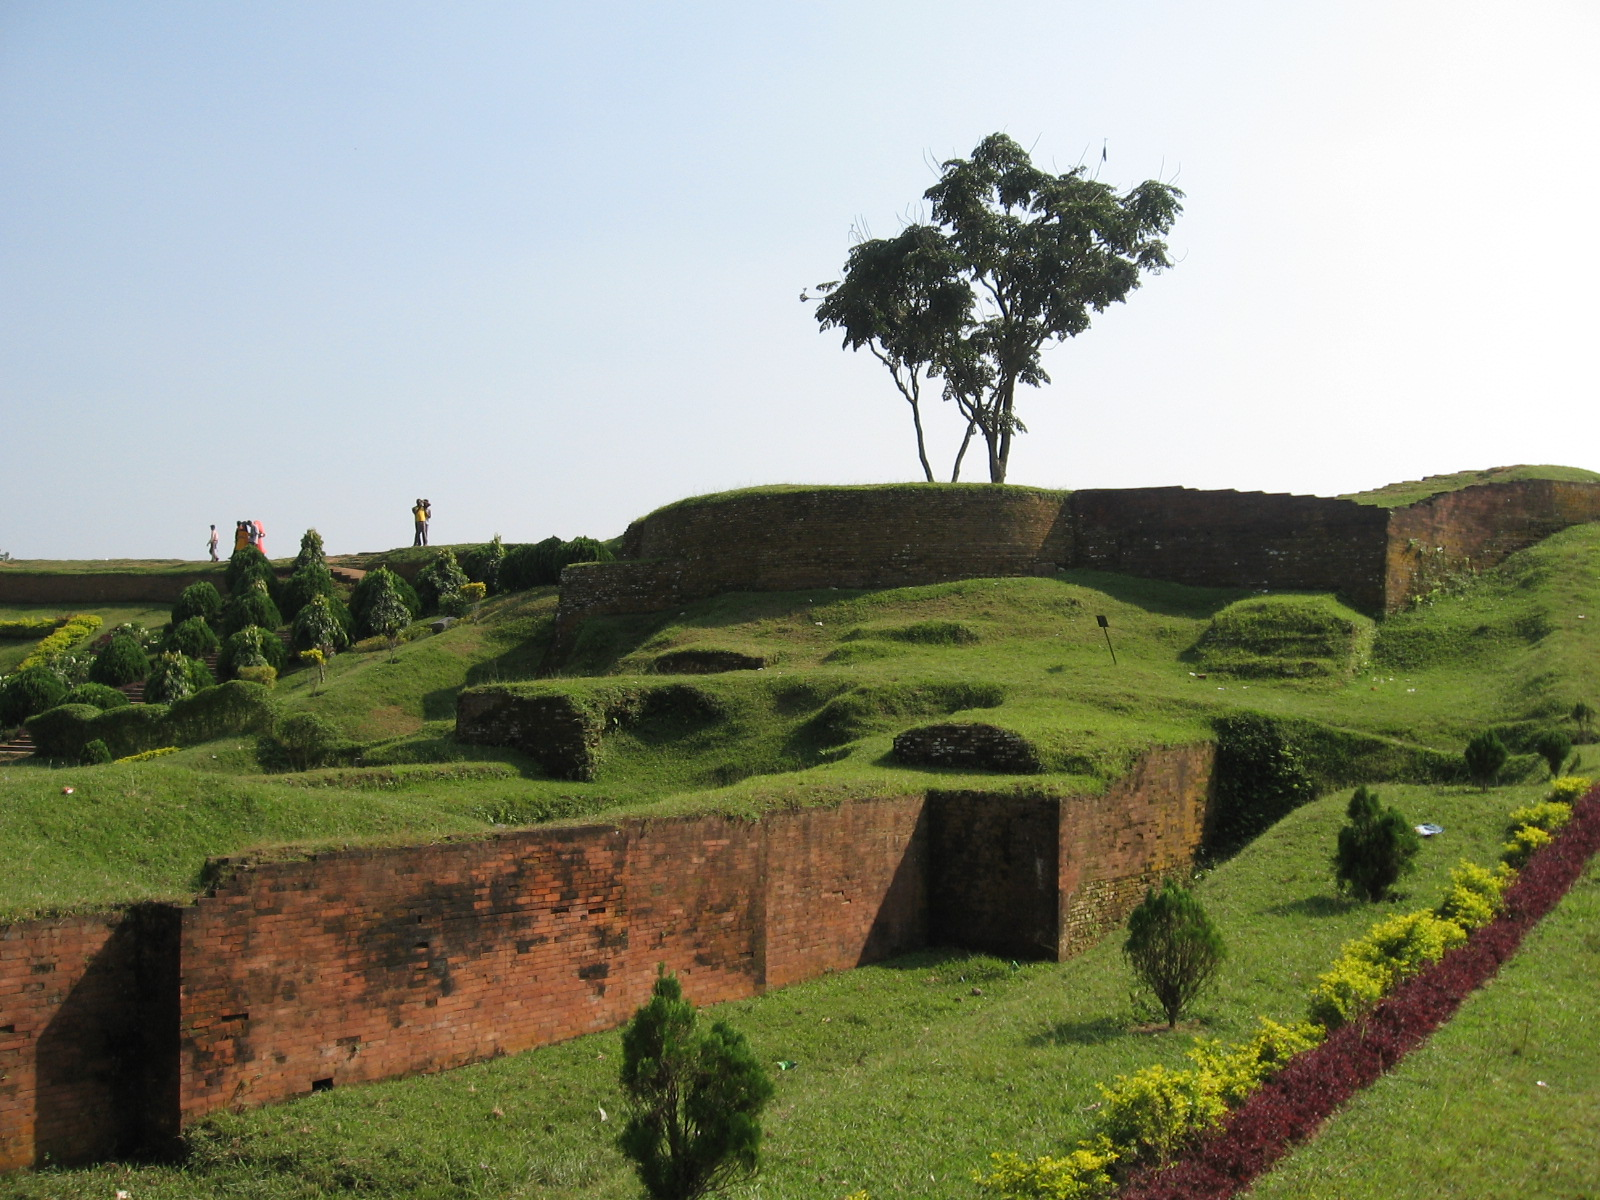 Ramparts of Mahsthangarh